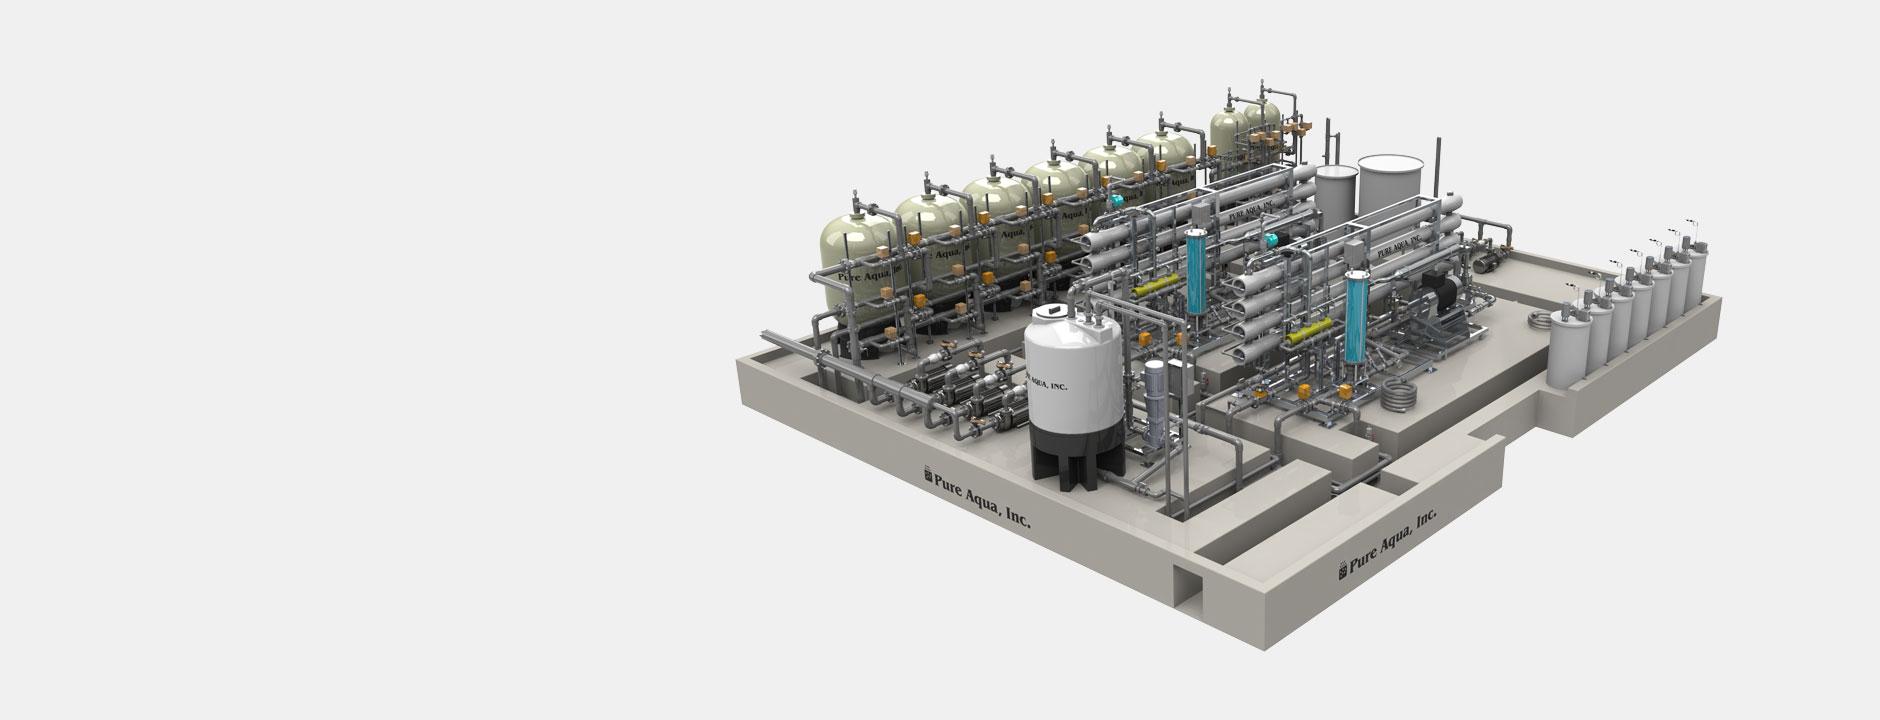 custom water purification systems أنظمة معالجة المياه المصنعة حسب الطلب